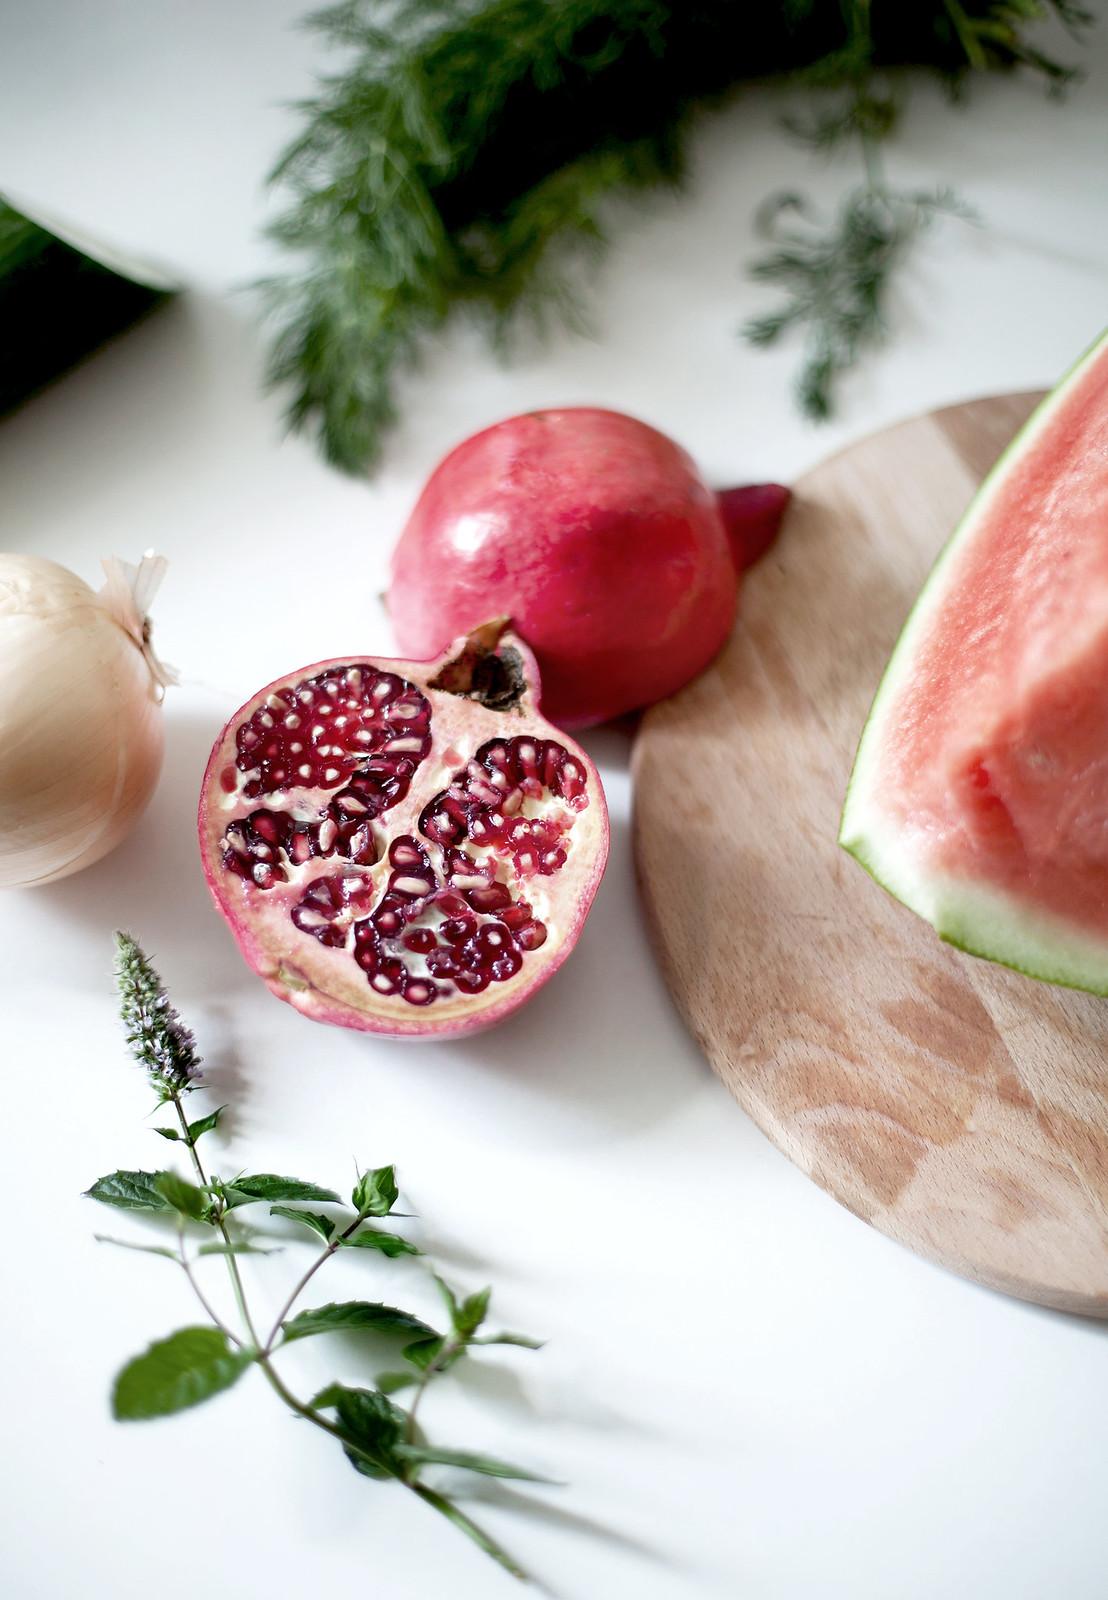 rezept kochen quiche salad cooking recipe morocco healthy fruit magazine lifestyle lifestyleblogger blogger germany berlin dusseldorf cats & dogs blog fashionblogger ricarda schernus 3